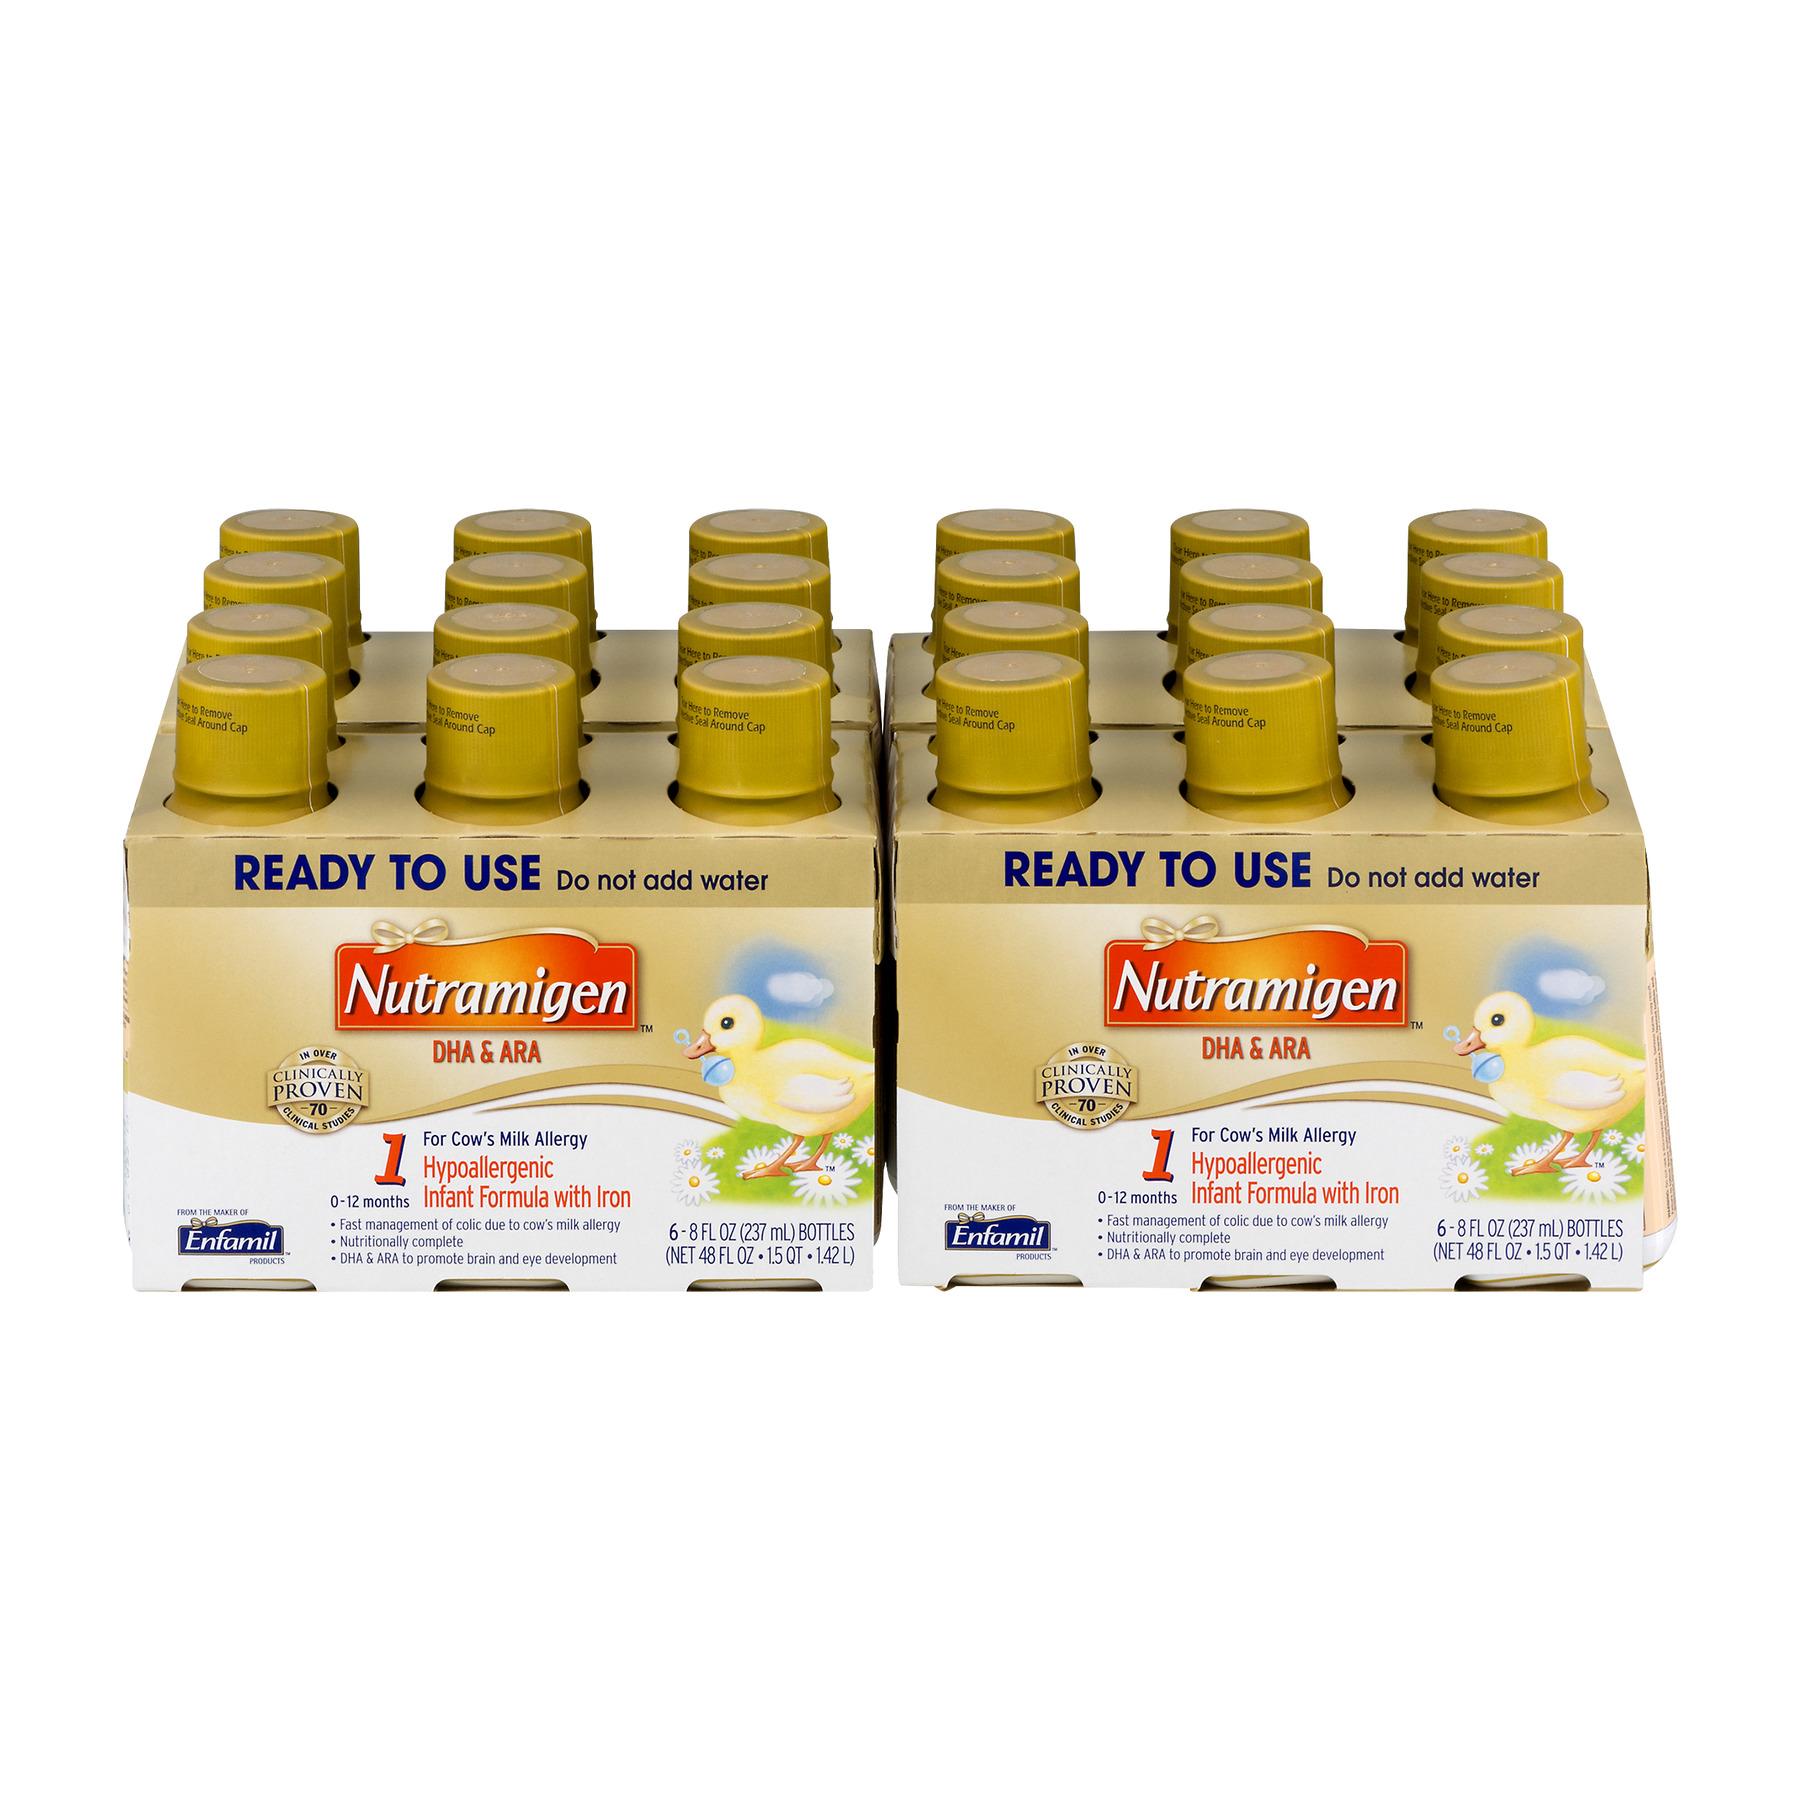 Mead Johnson & Company, LLC. Nutramigen DHA & ARA Hypoallergenic Infant Formula with Iron 0 - 12M  -  24 CT